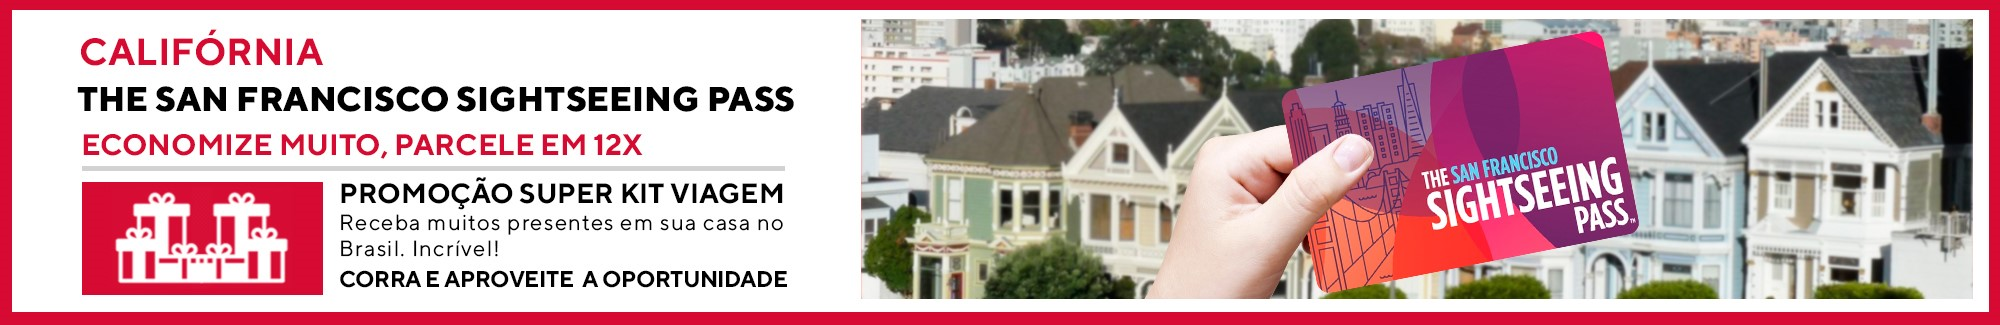 The San Francisco Sightseeing Pass